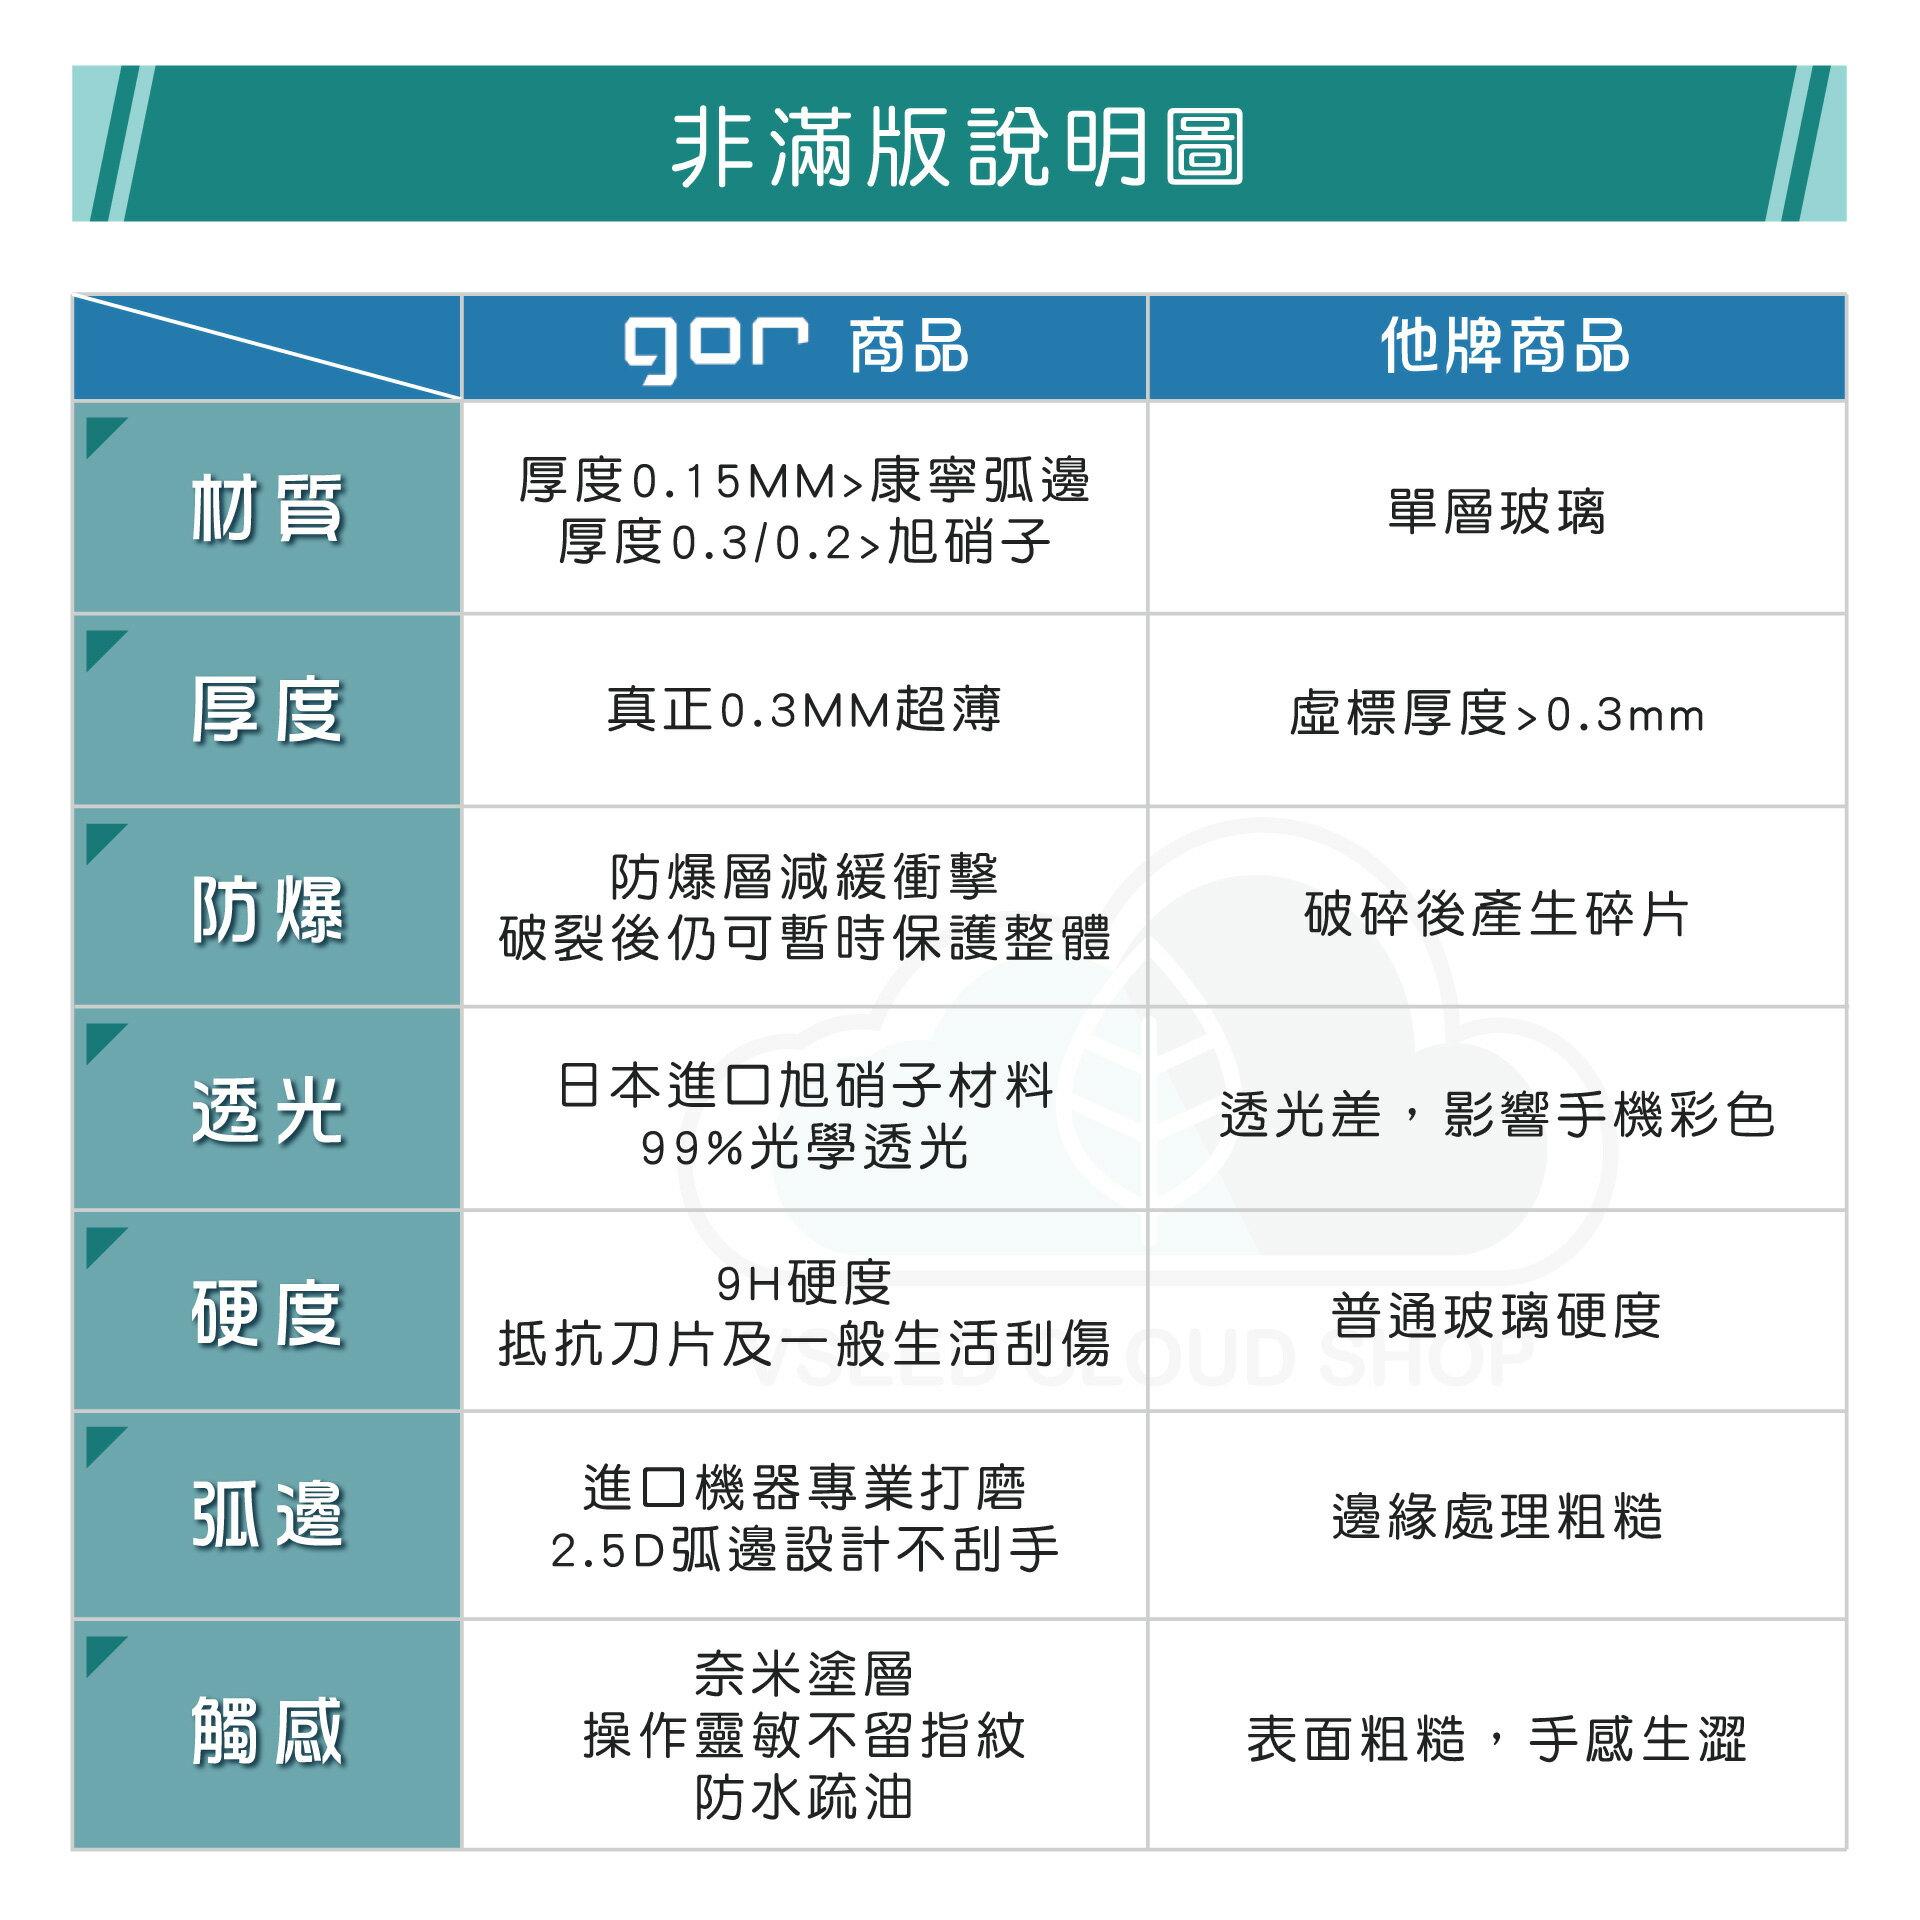 GOR 9H 熱賣型號 iphone 12 mini 12 pro 12 pro max鋼化 玻璃 保護貼 全透明非滿版 兩片裝【全館滿299免運費】